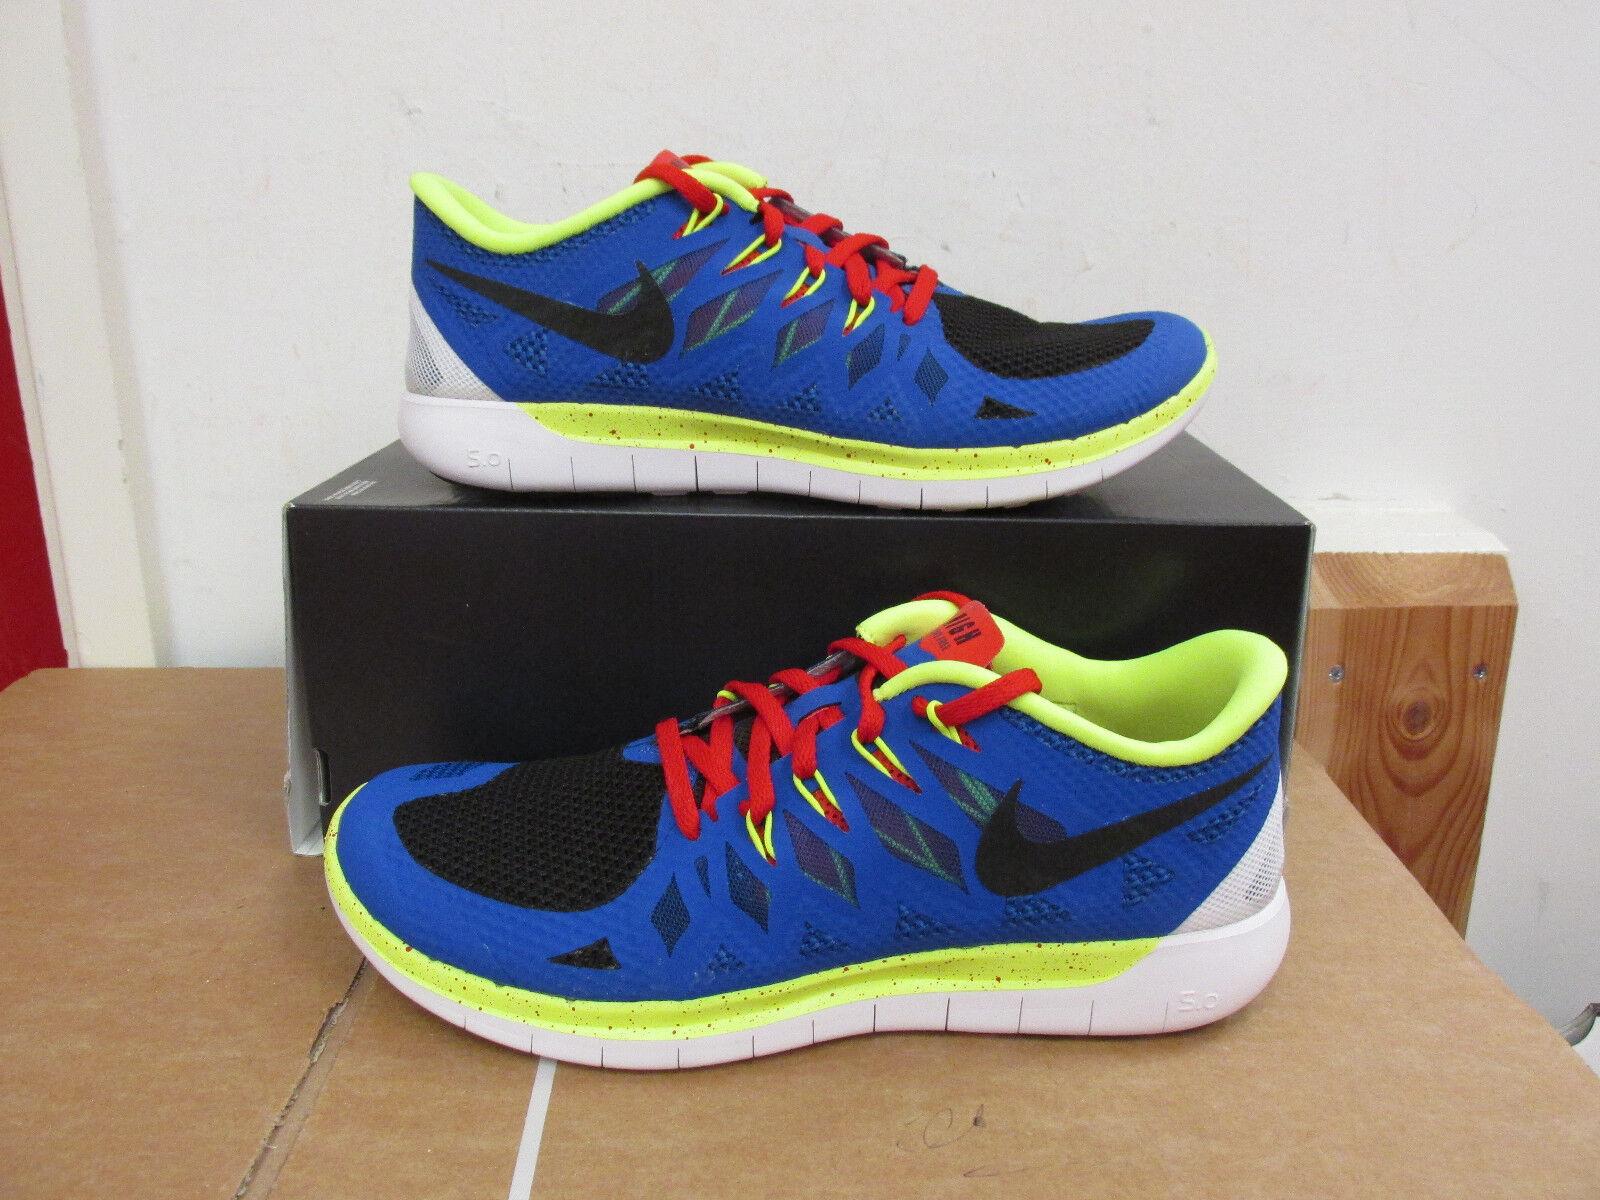 Nike ID Sautope Da Ginnastica Da Uomo gratuito 5.0 653713 991 Sautope Da Ginnastica US 8.5 EU 42 Sautope classeiche da uomo